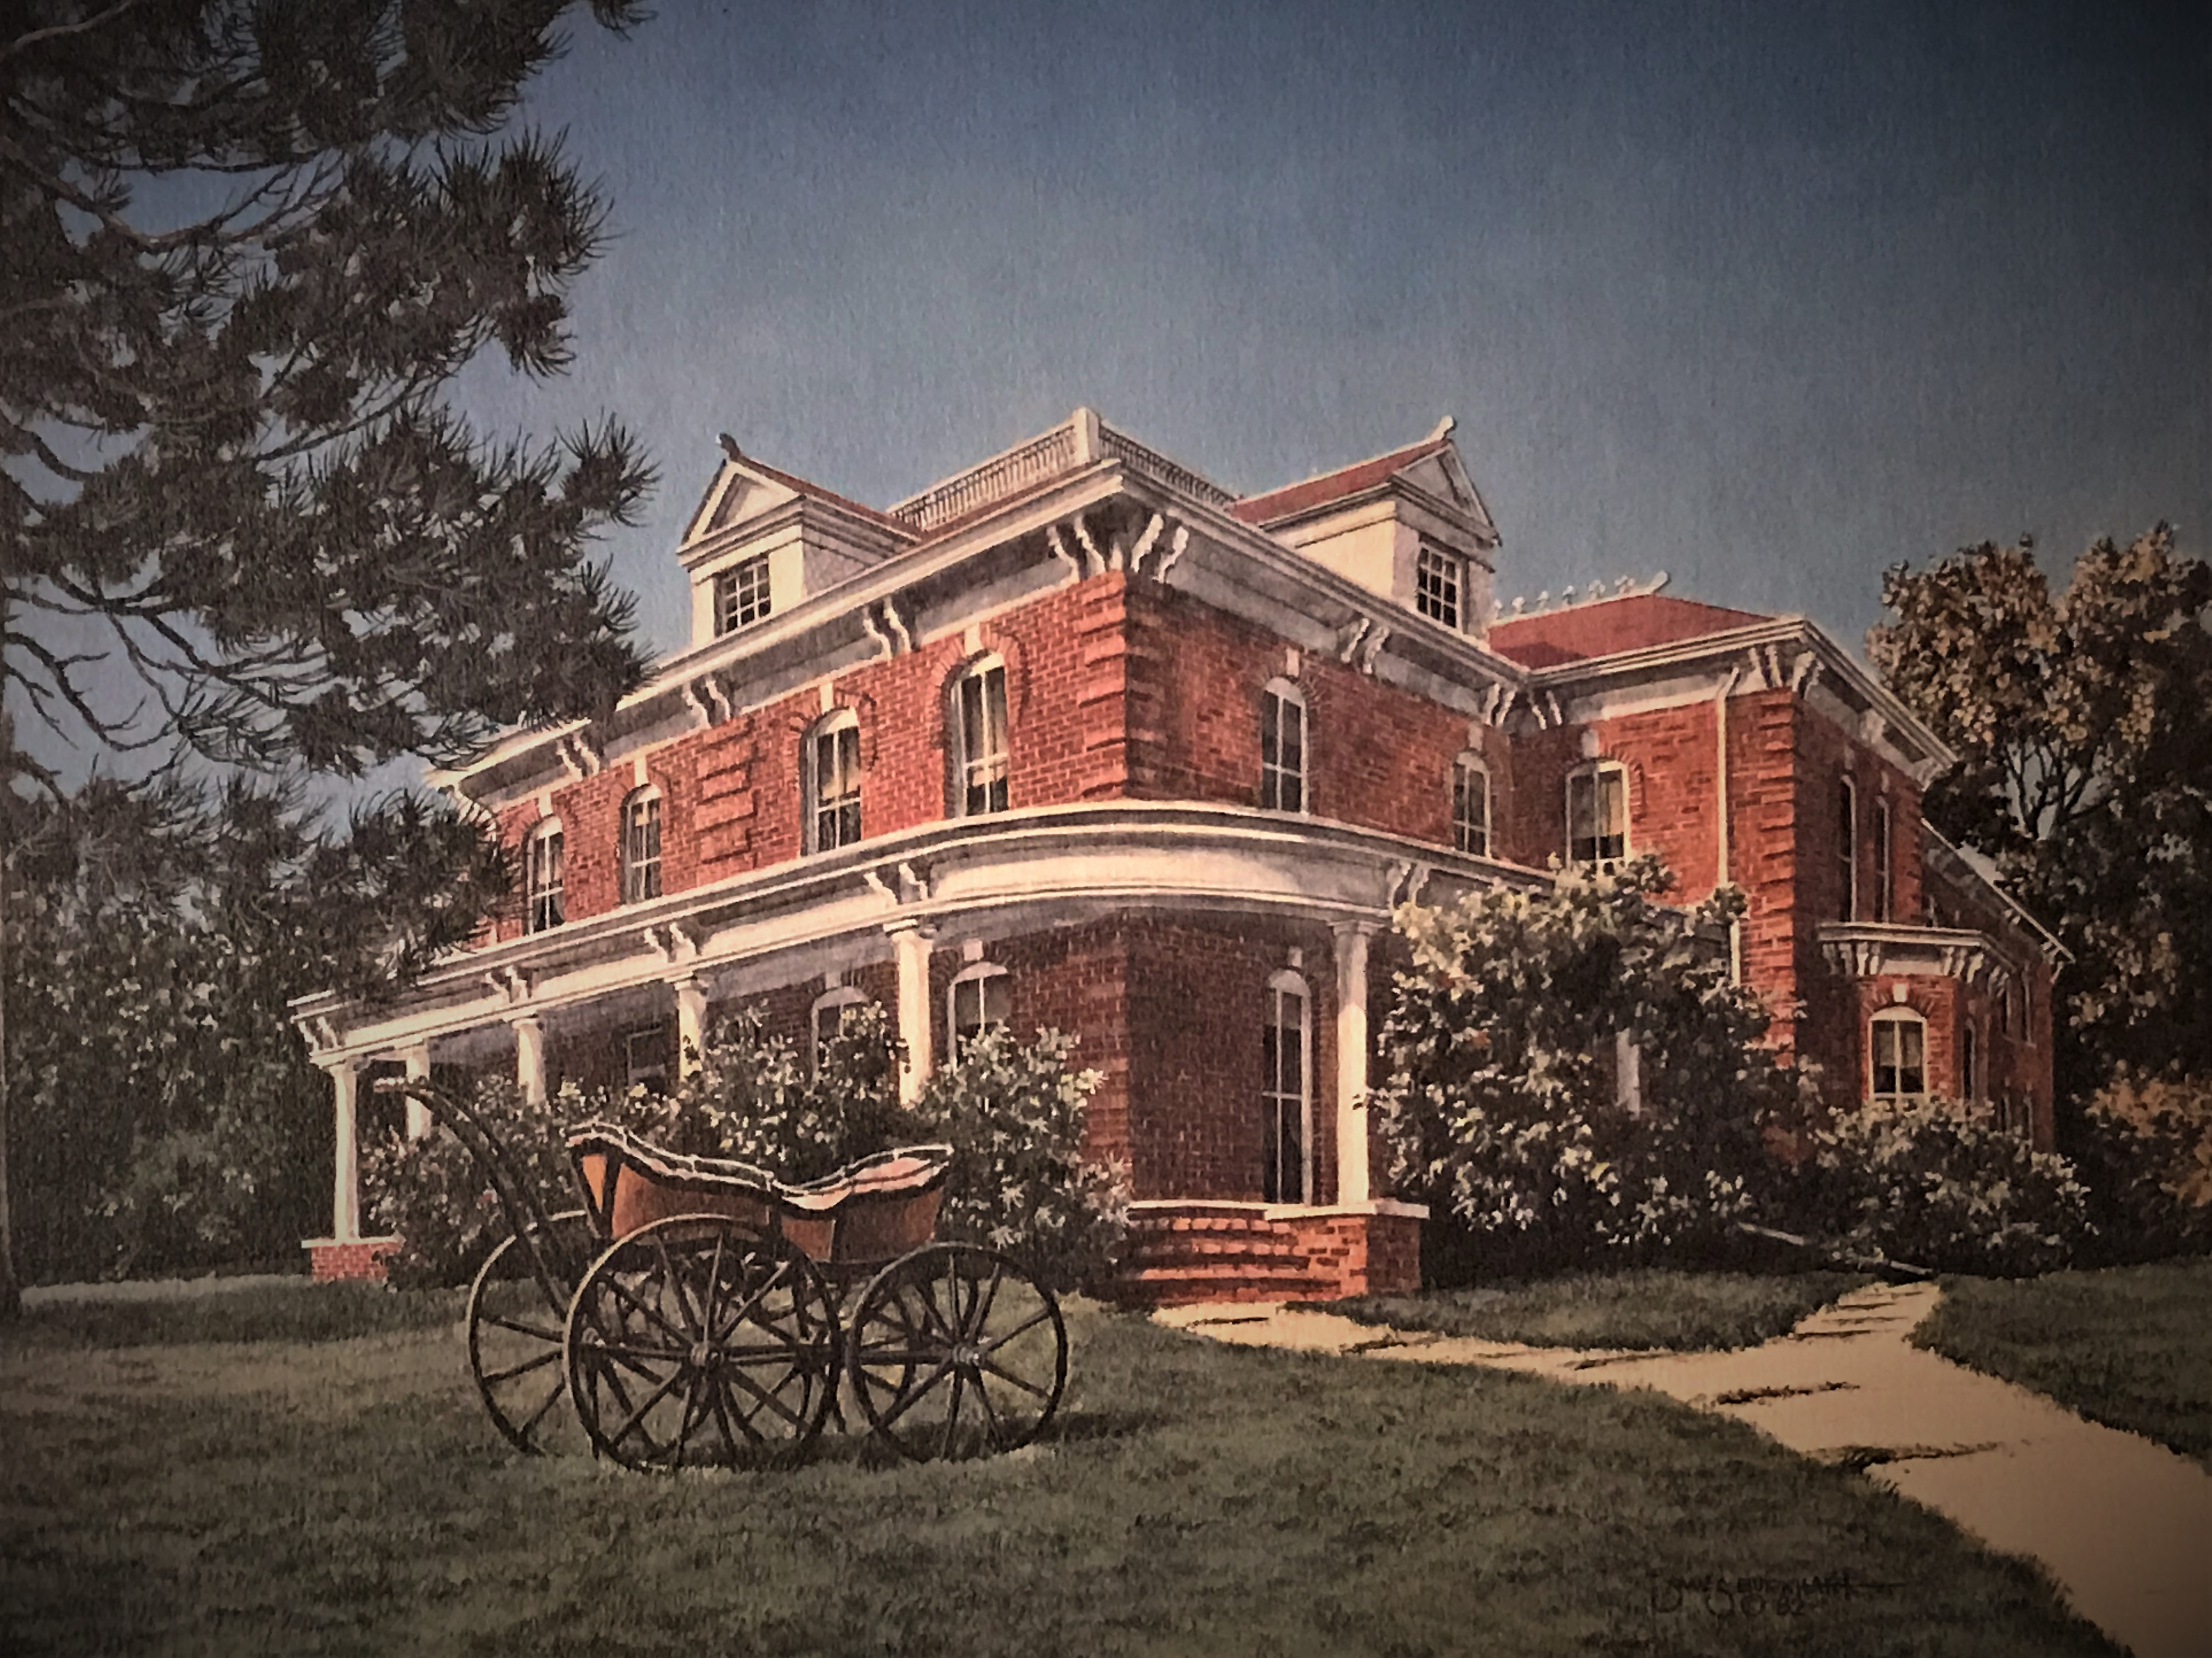 Dunnegan-Wainscott Estates   Historic Real Estate & Estate Auction  (3 Days)